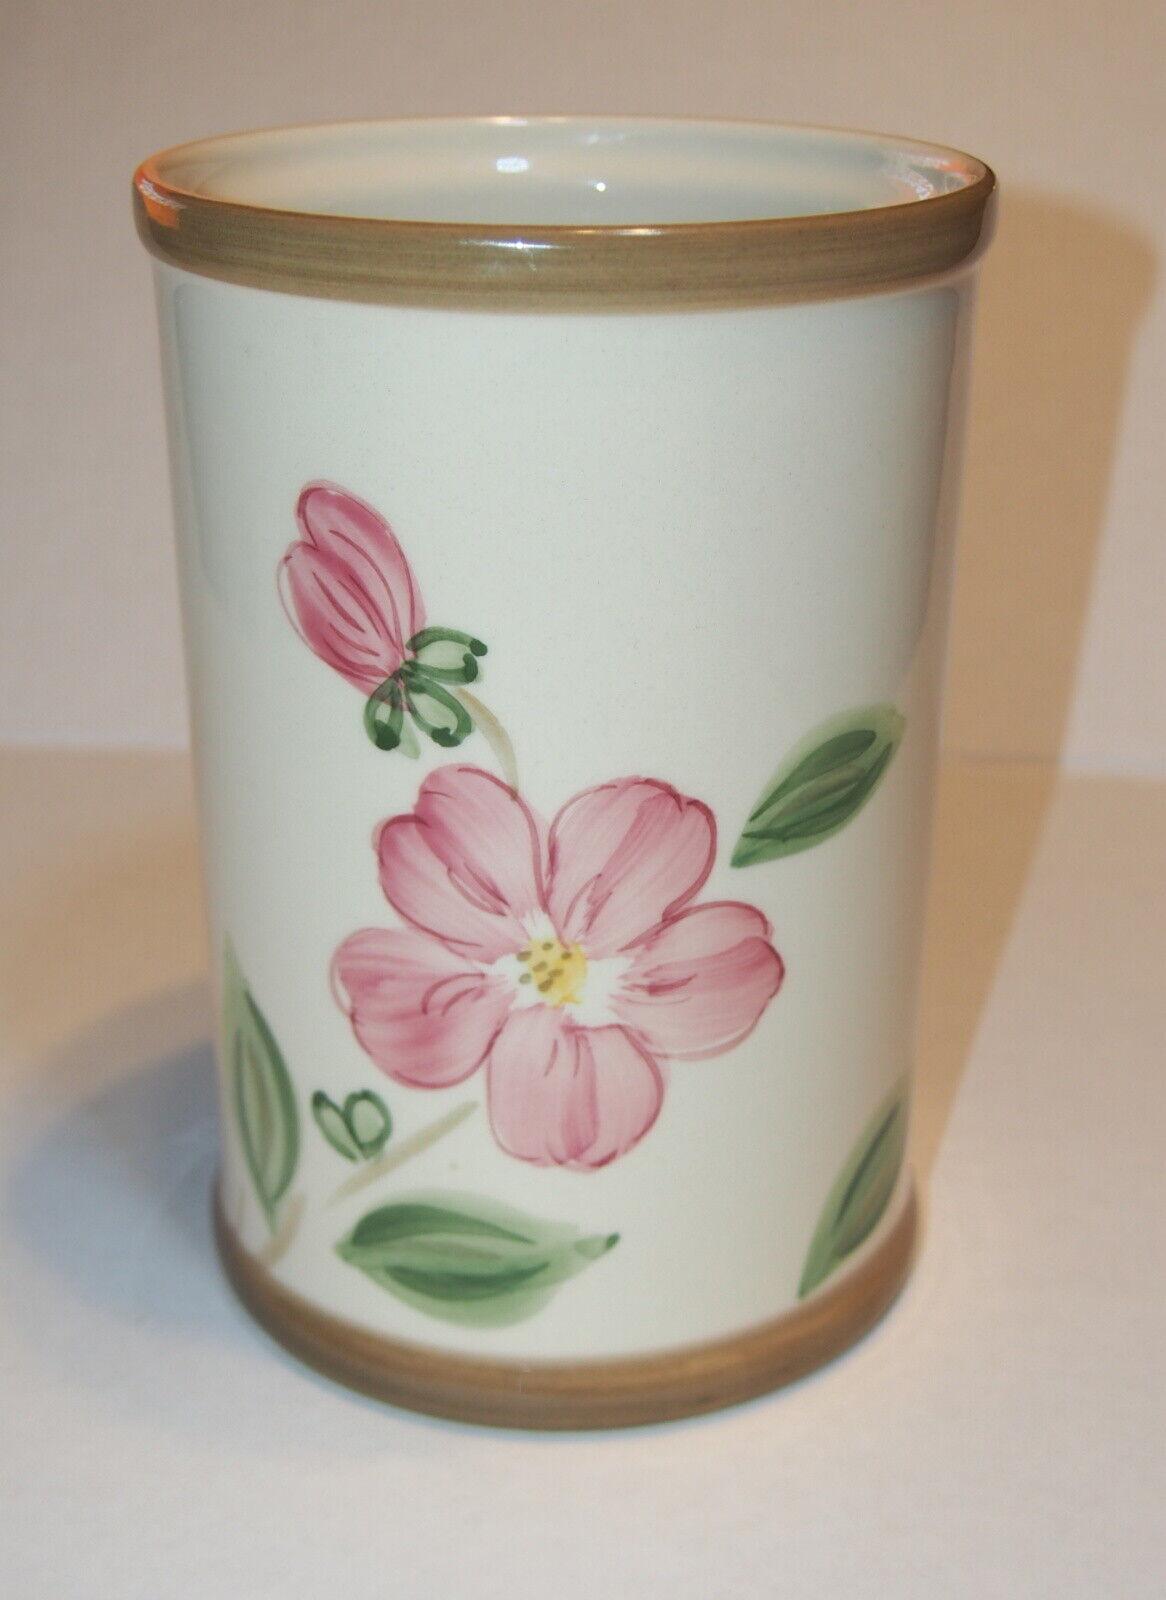 Rhododendron 'Baden' 15cm Pot Pot Pot Größe 67c8d5